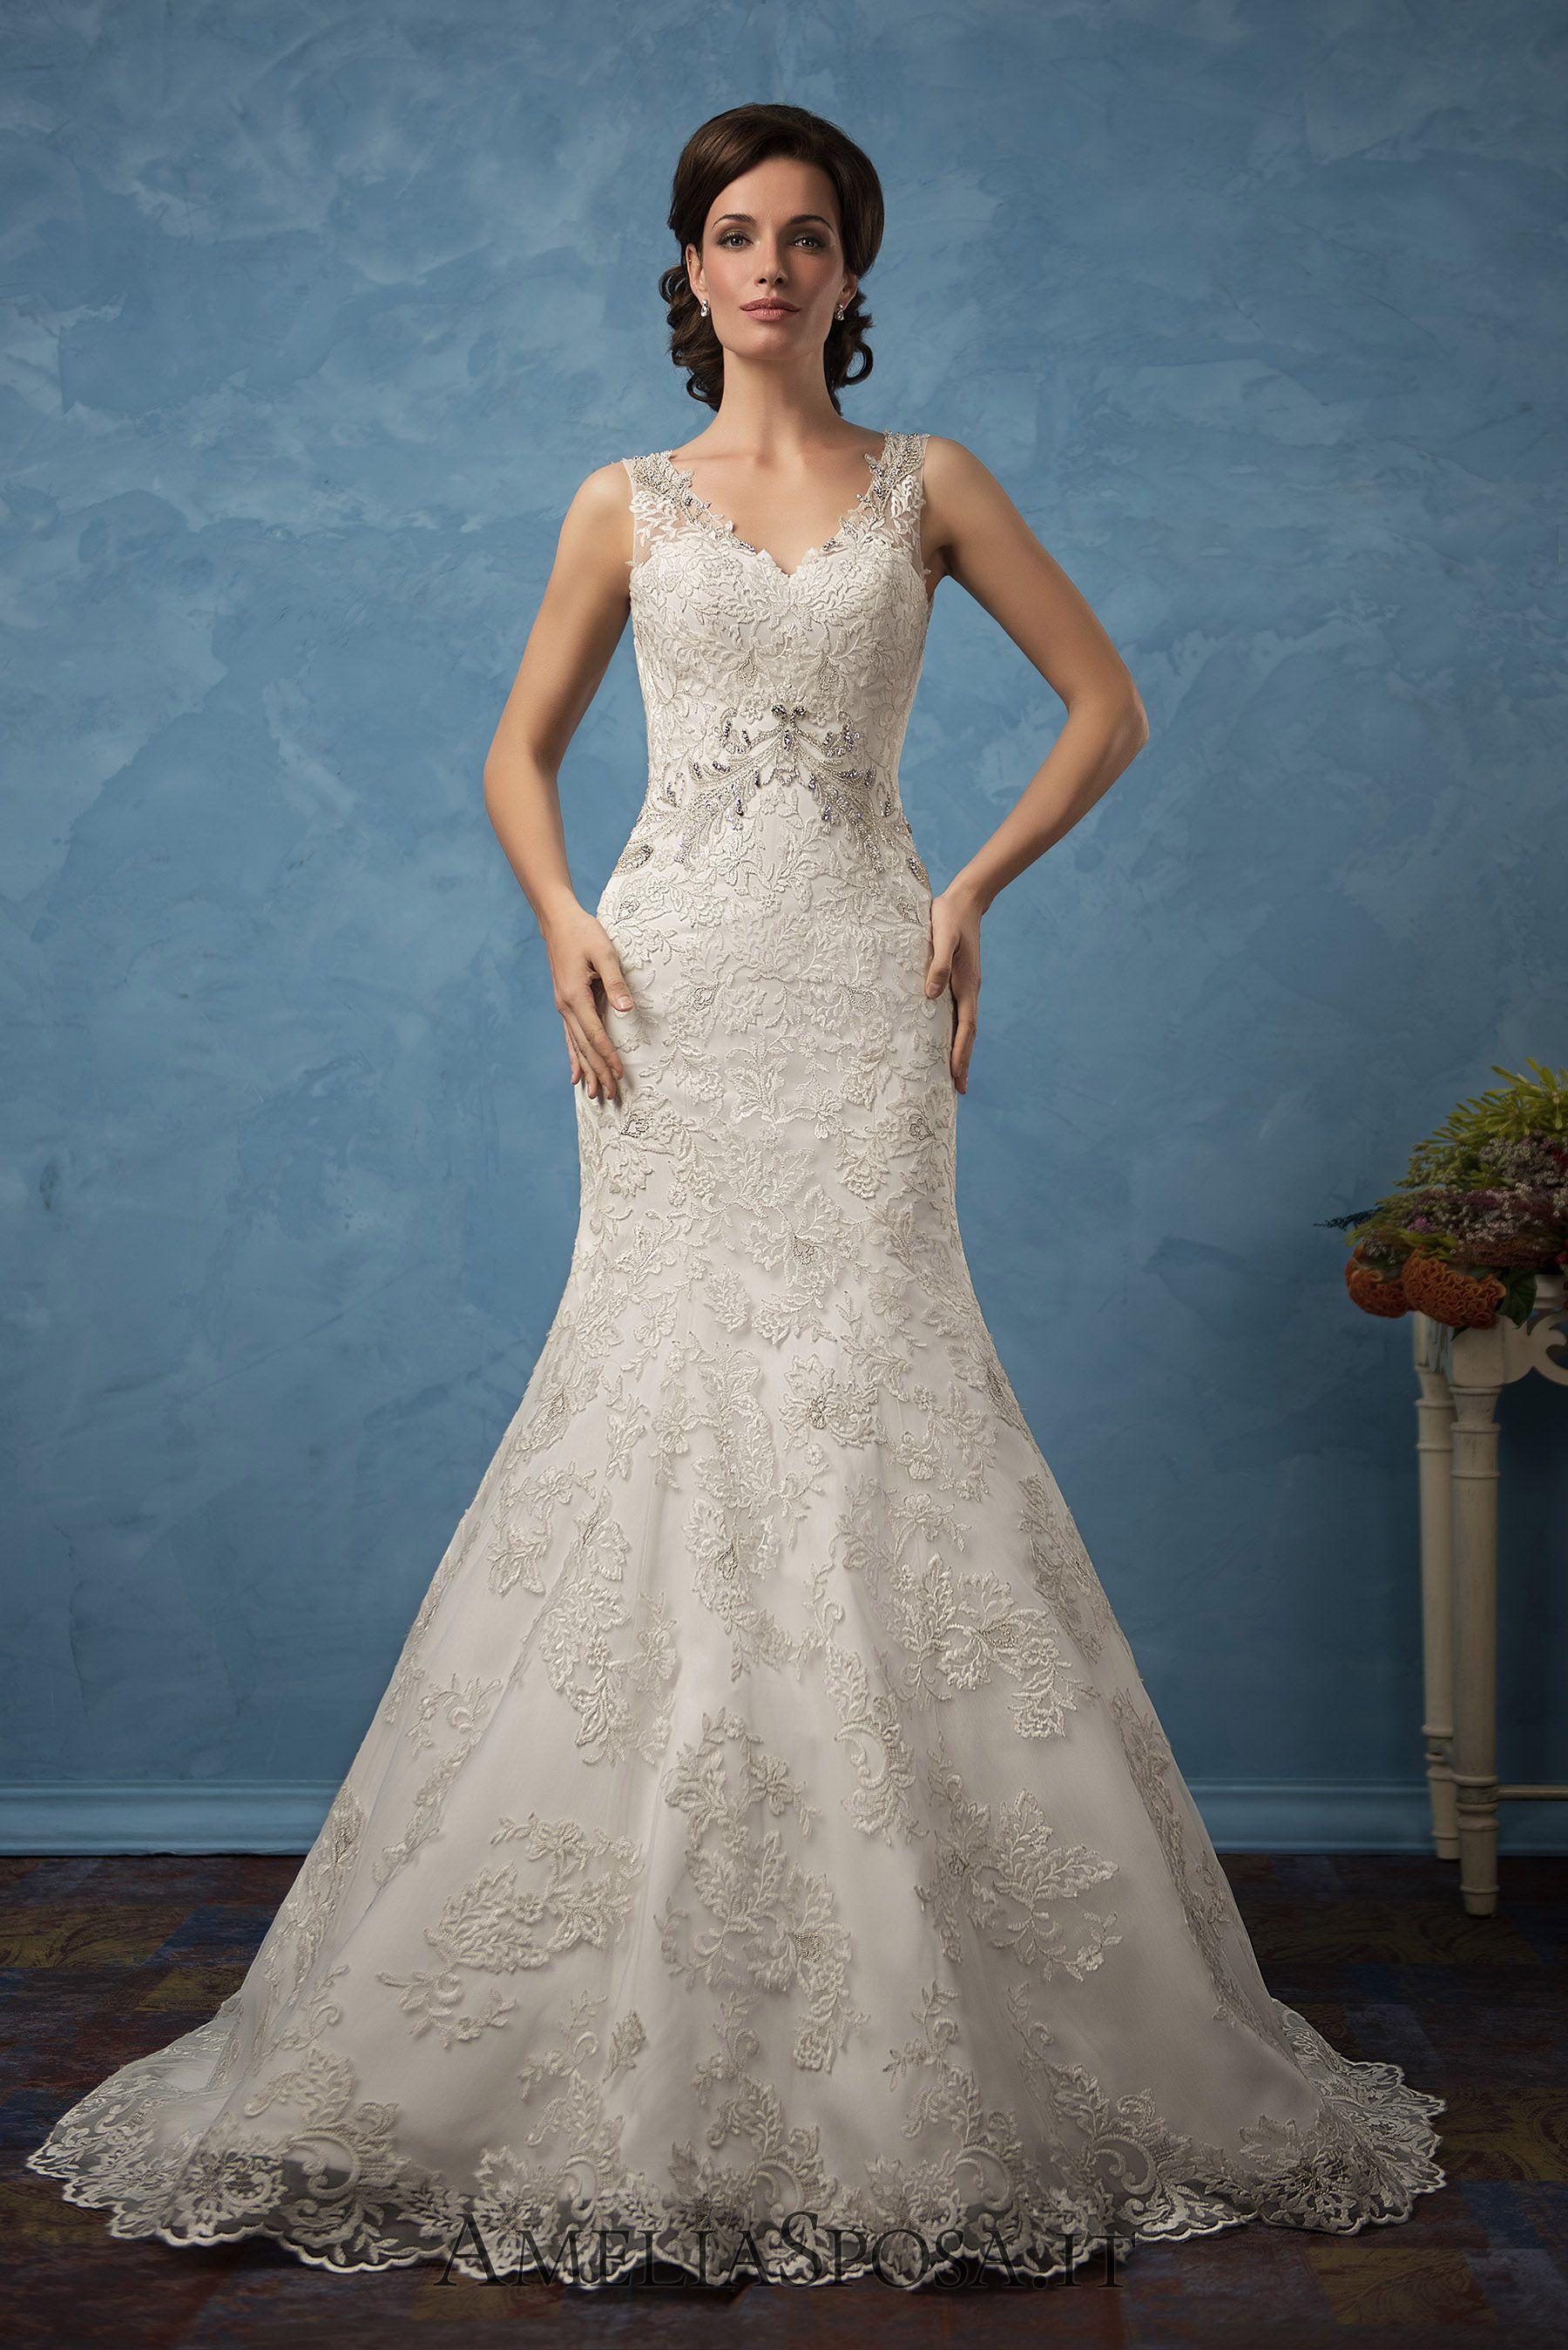 Wedding Dress Sharon, Silhouette: Mermaid | All About Weddings ...